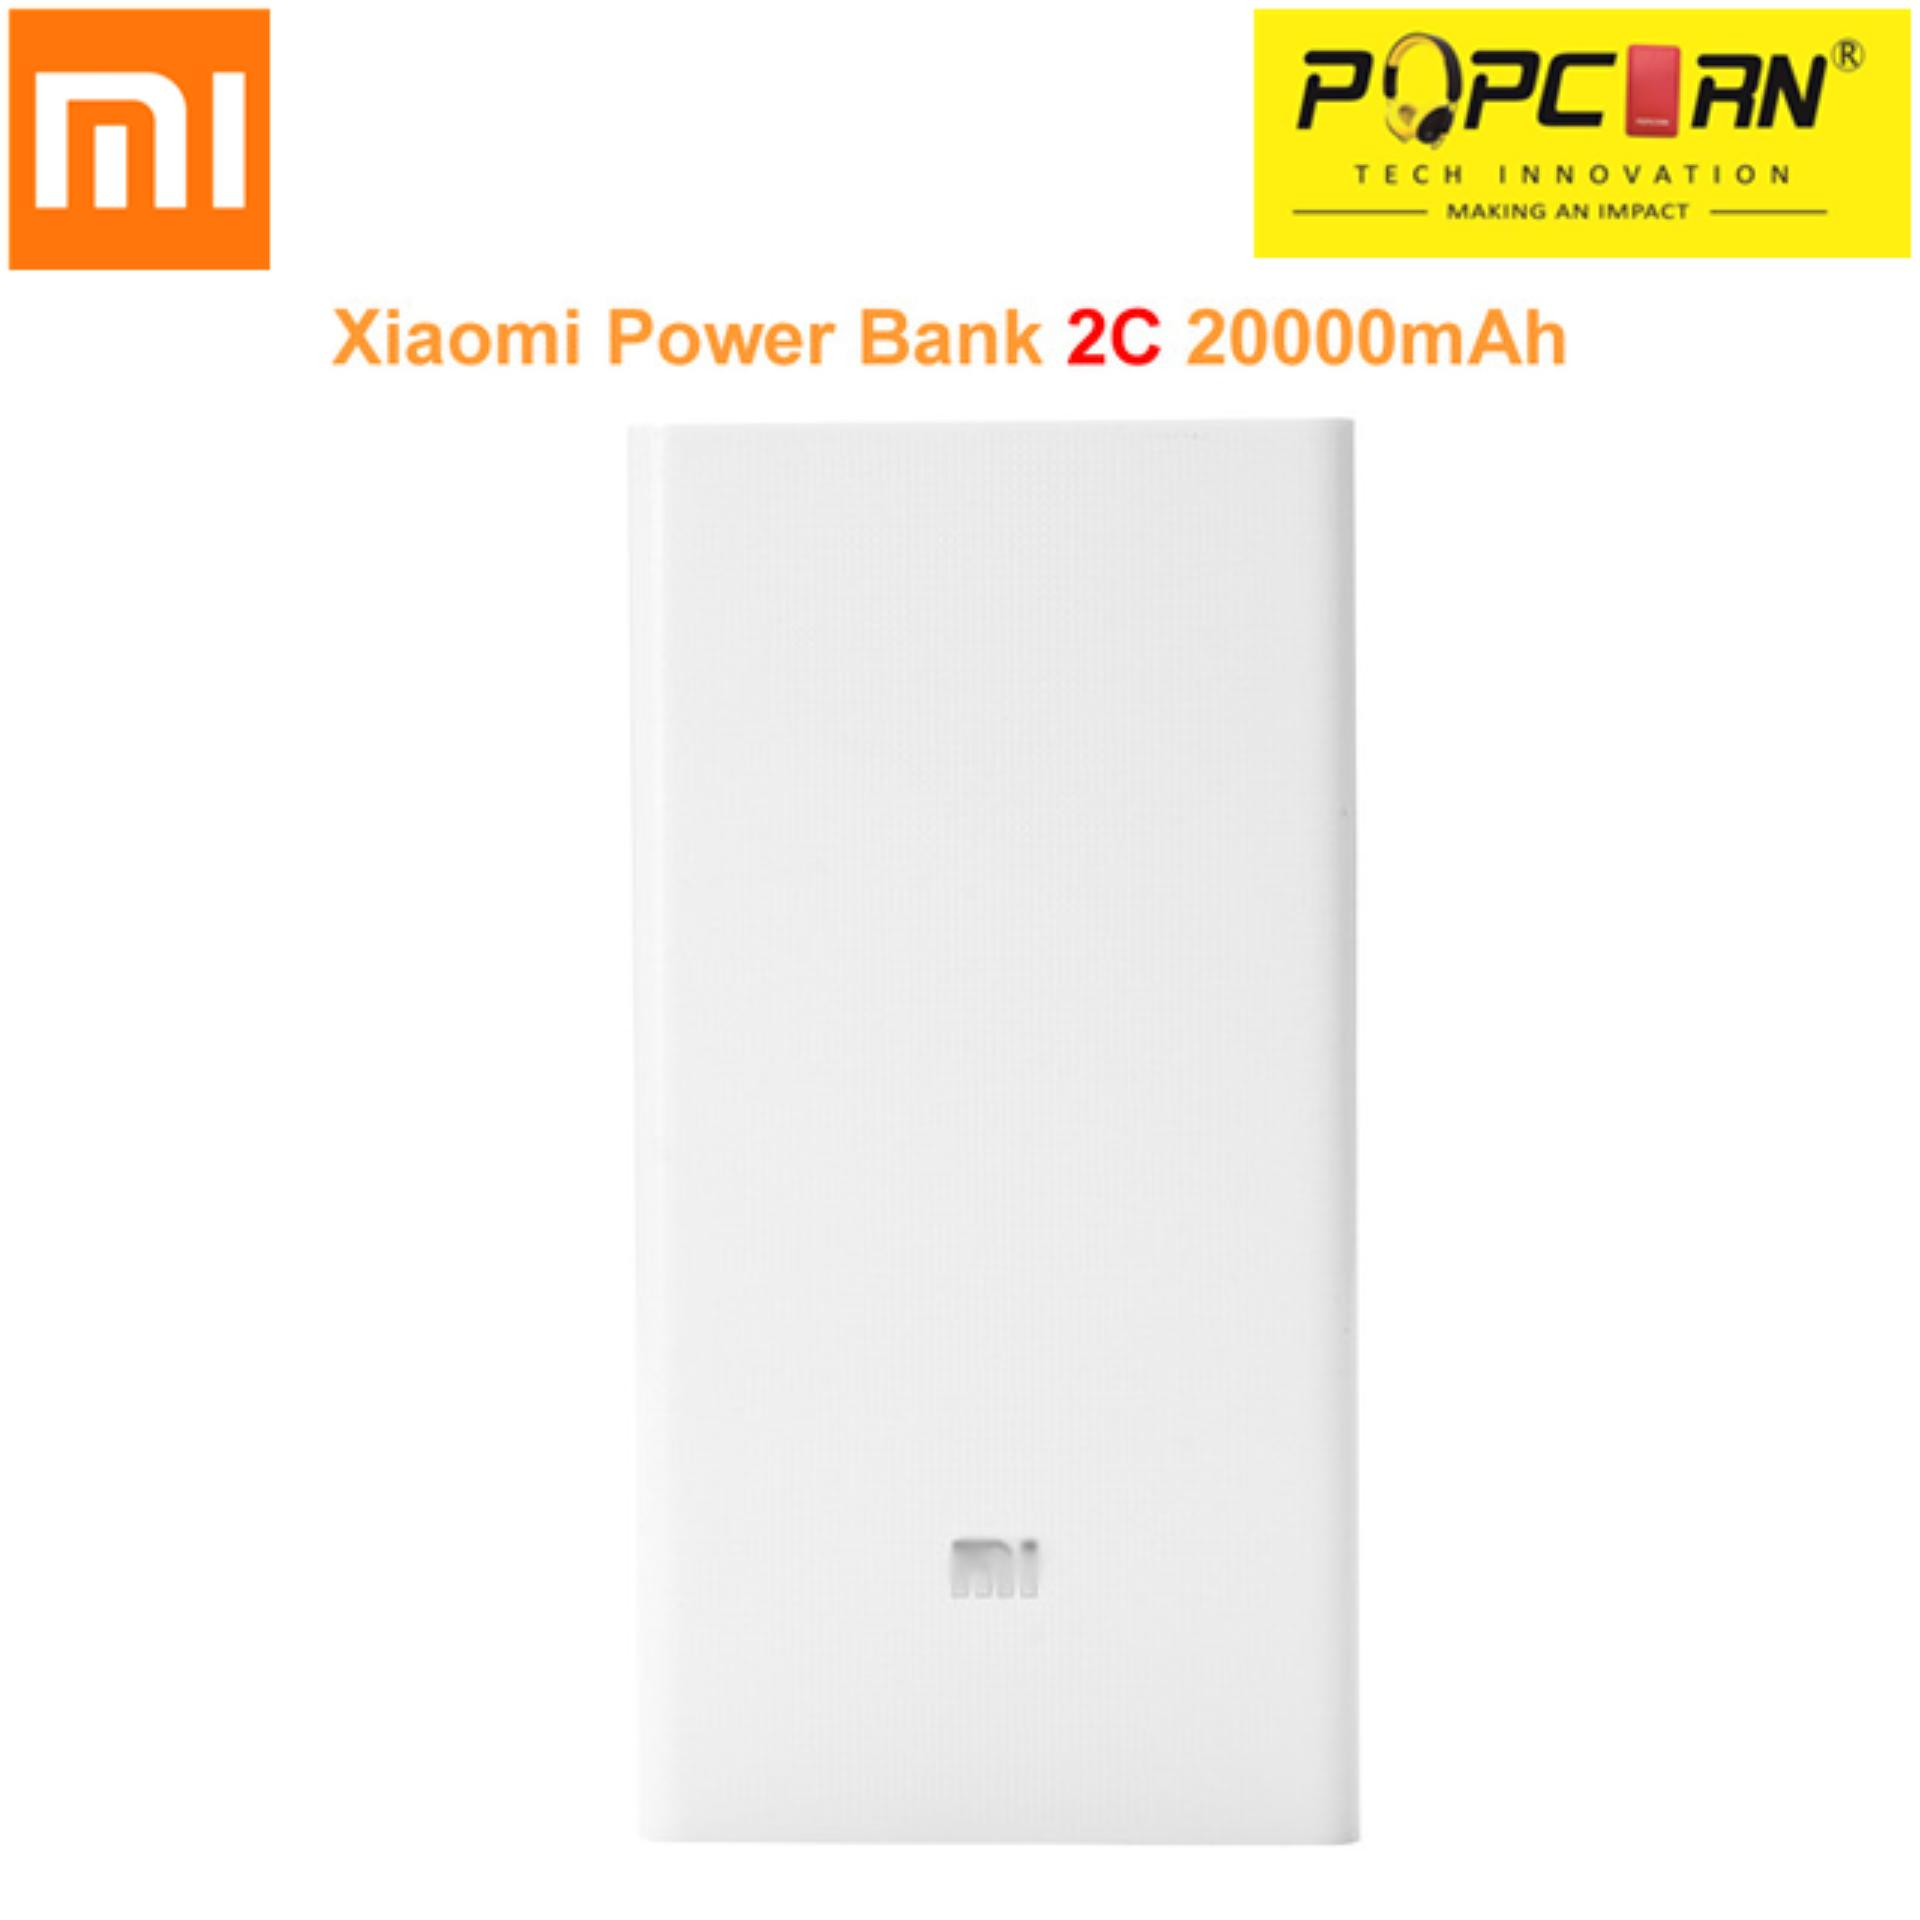 Xiaomi Philippines Power Bank For Sale Prices Reviews Powerbank Slim 10000ma Mi 20000mah 2c Qc 30 Portable Charger Fast Powerbankwhite